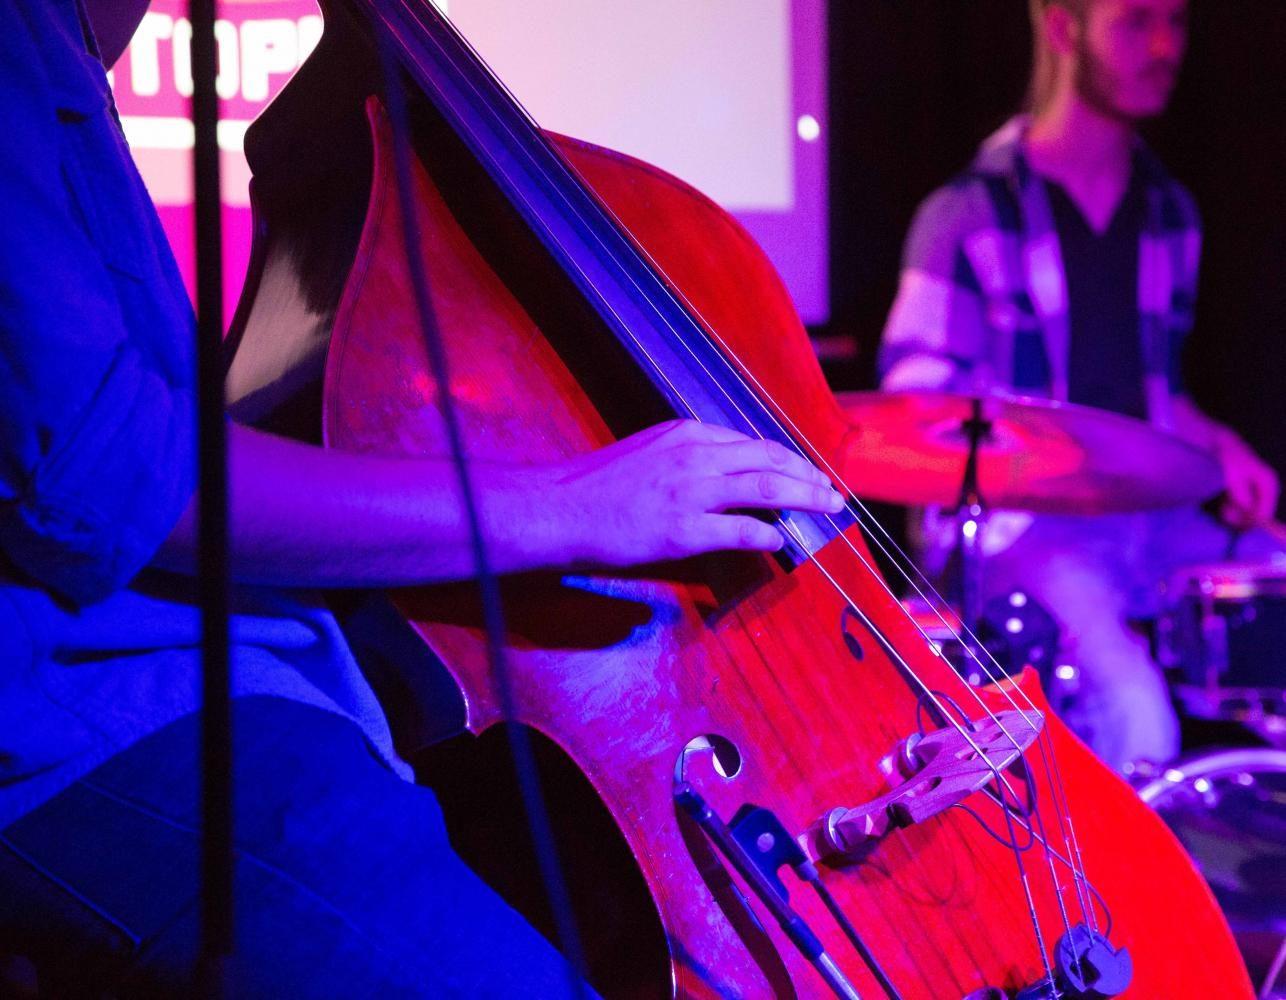 Jazz studies major Clayton Ryan, who organized Monday's jazz jam, played standup bass on the Octopus stage.